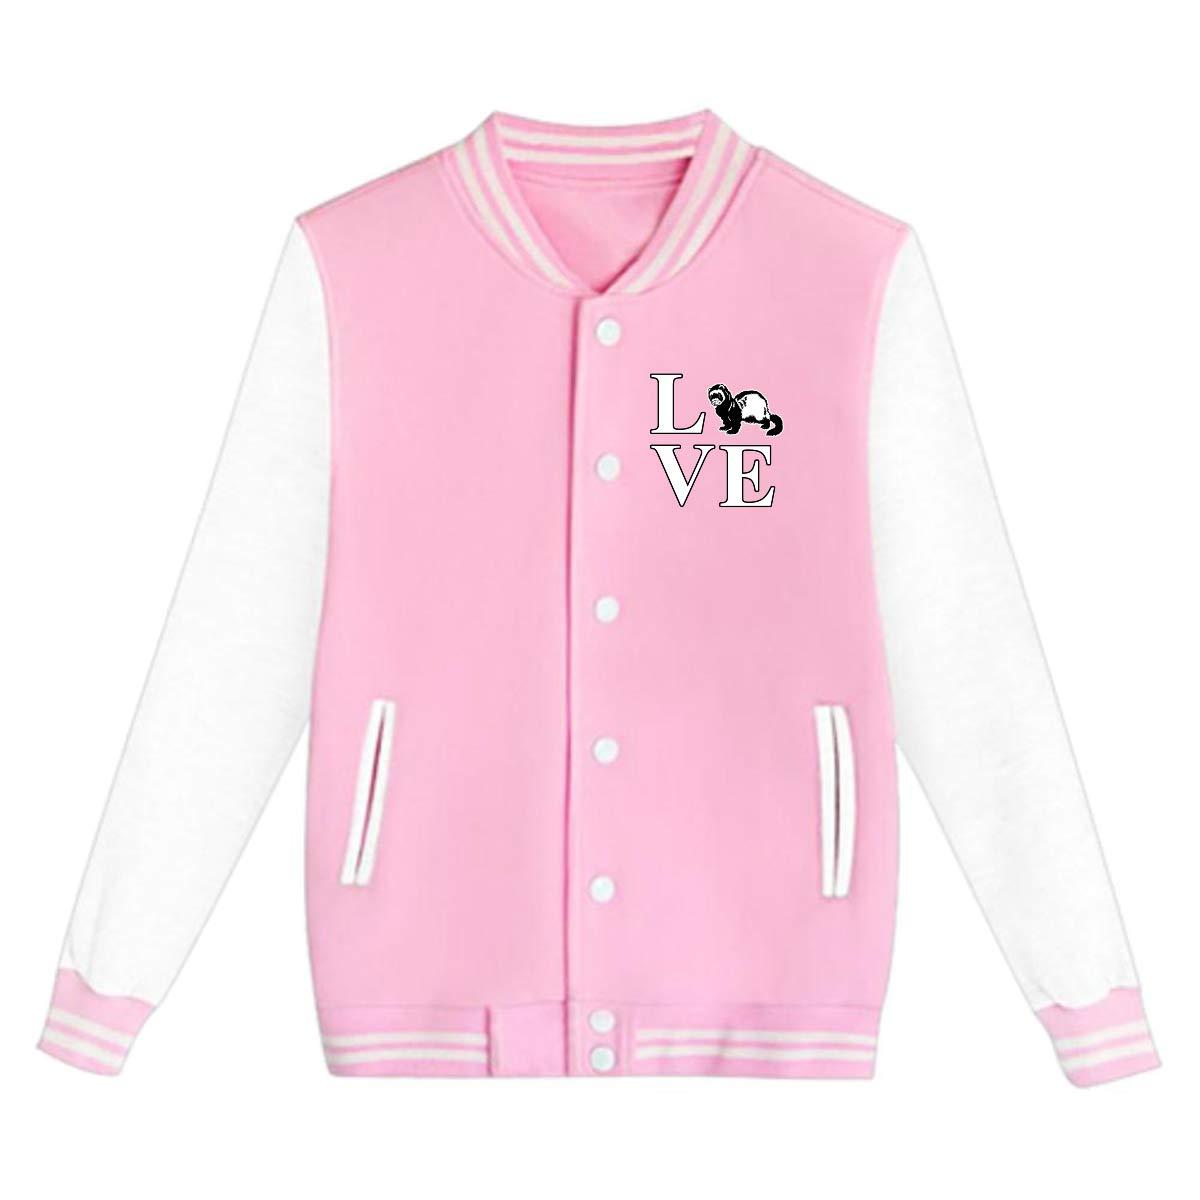 Tina TN I Love Ferrets Teens Boys Girl Varsity Baseball Jacket Long Sleeve Sport Baseball Uniform Jacket Coat Sweater Black